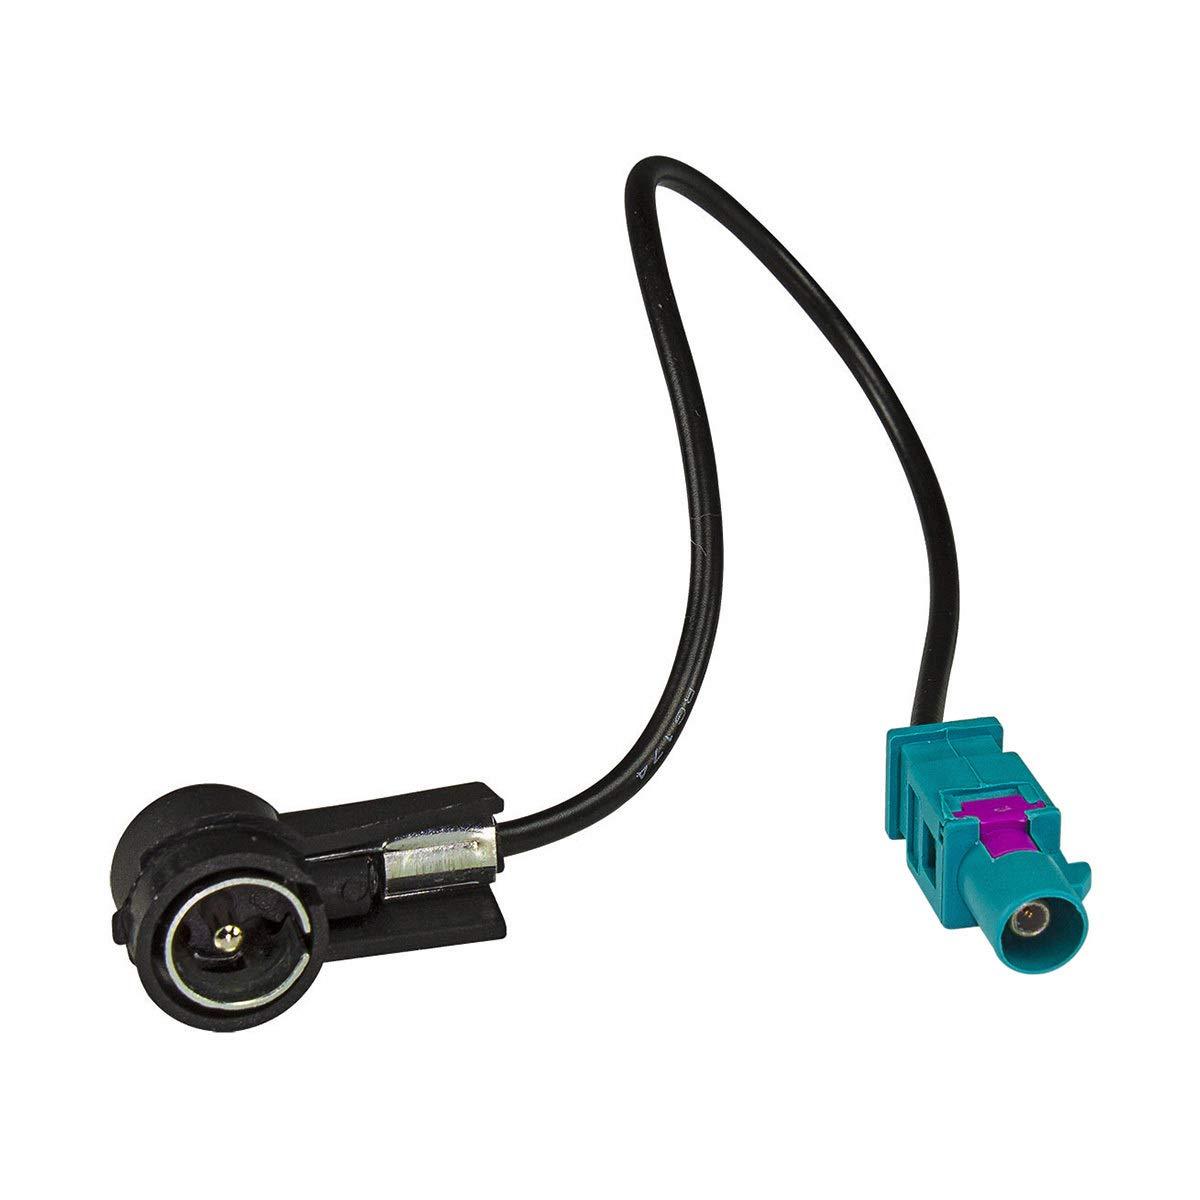 tomzz Audio 2404-016 Radioblende Set passend f/ür BMW 3er E46 mit Quadlockadapter ISO Fakra Antennenadapter ISO